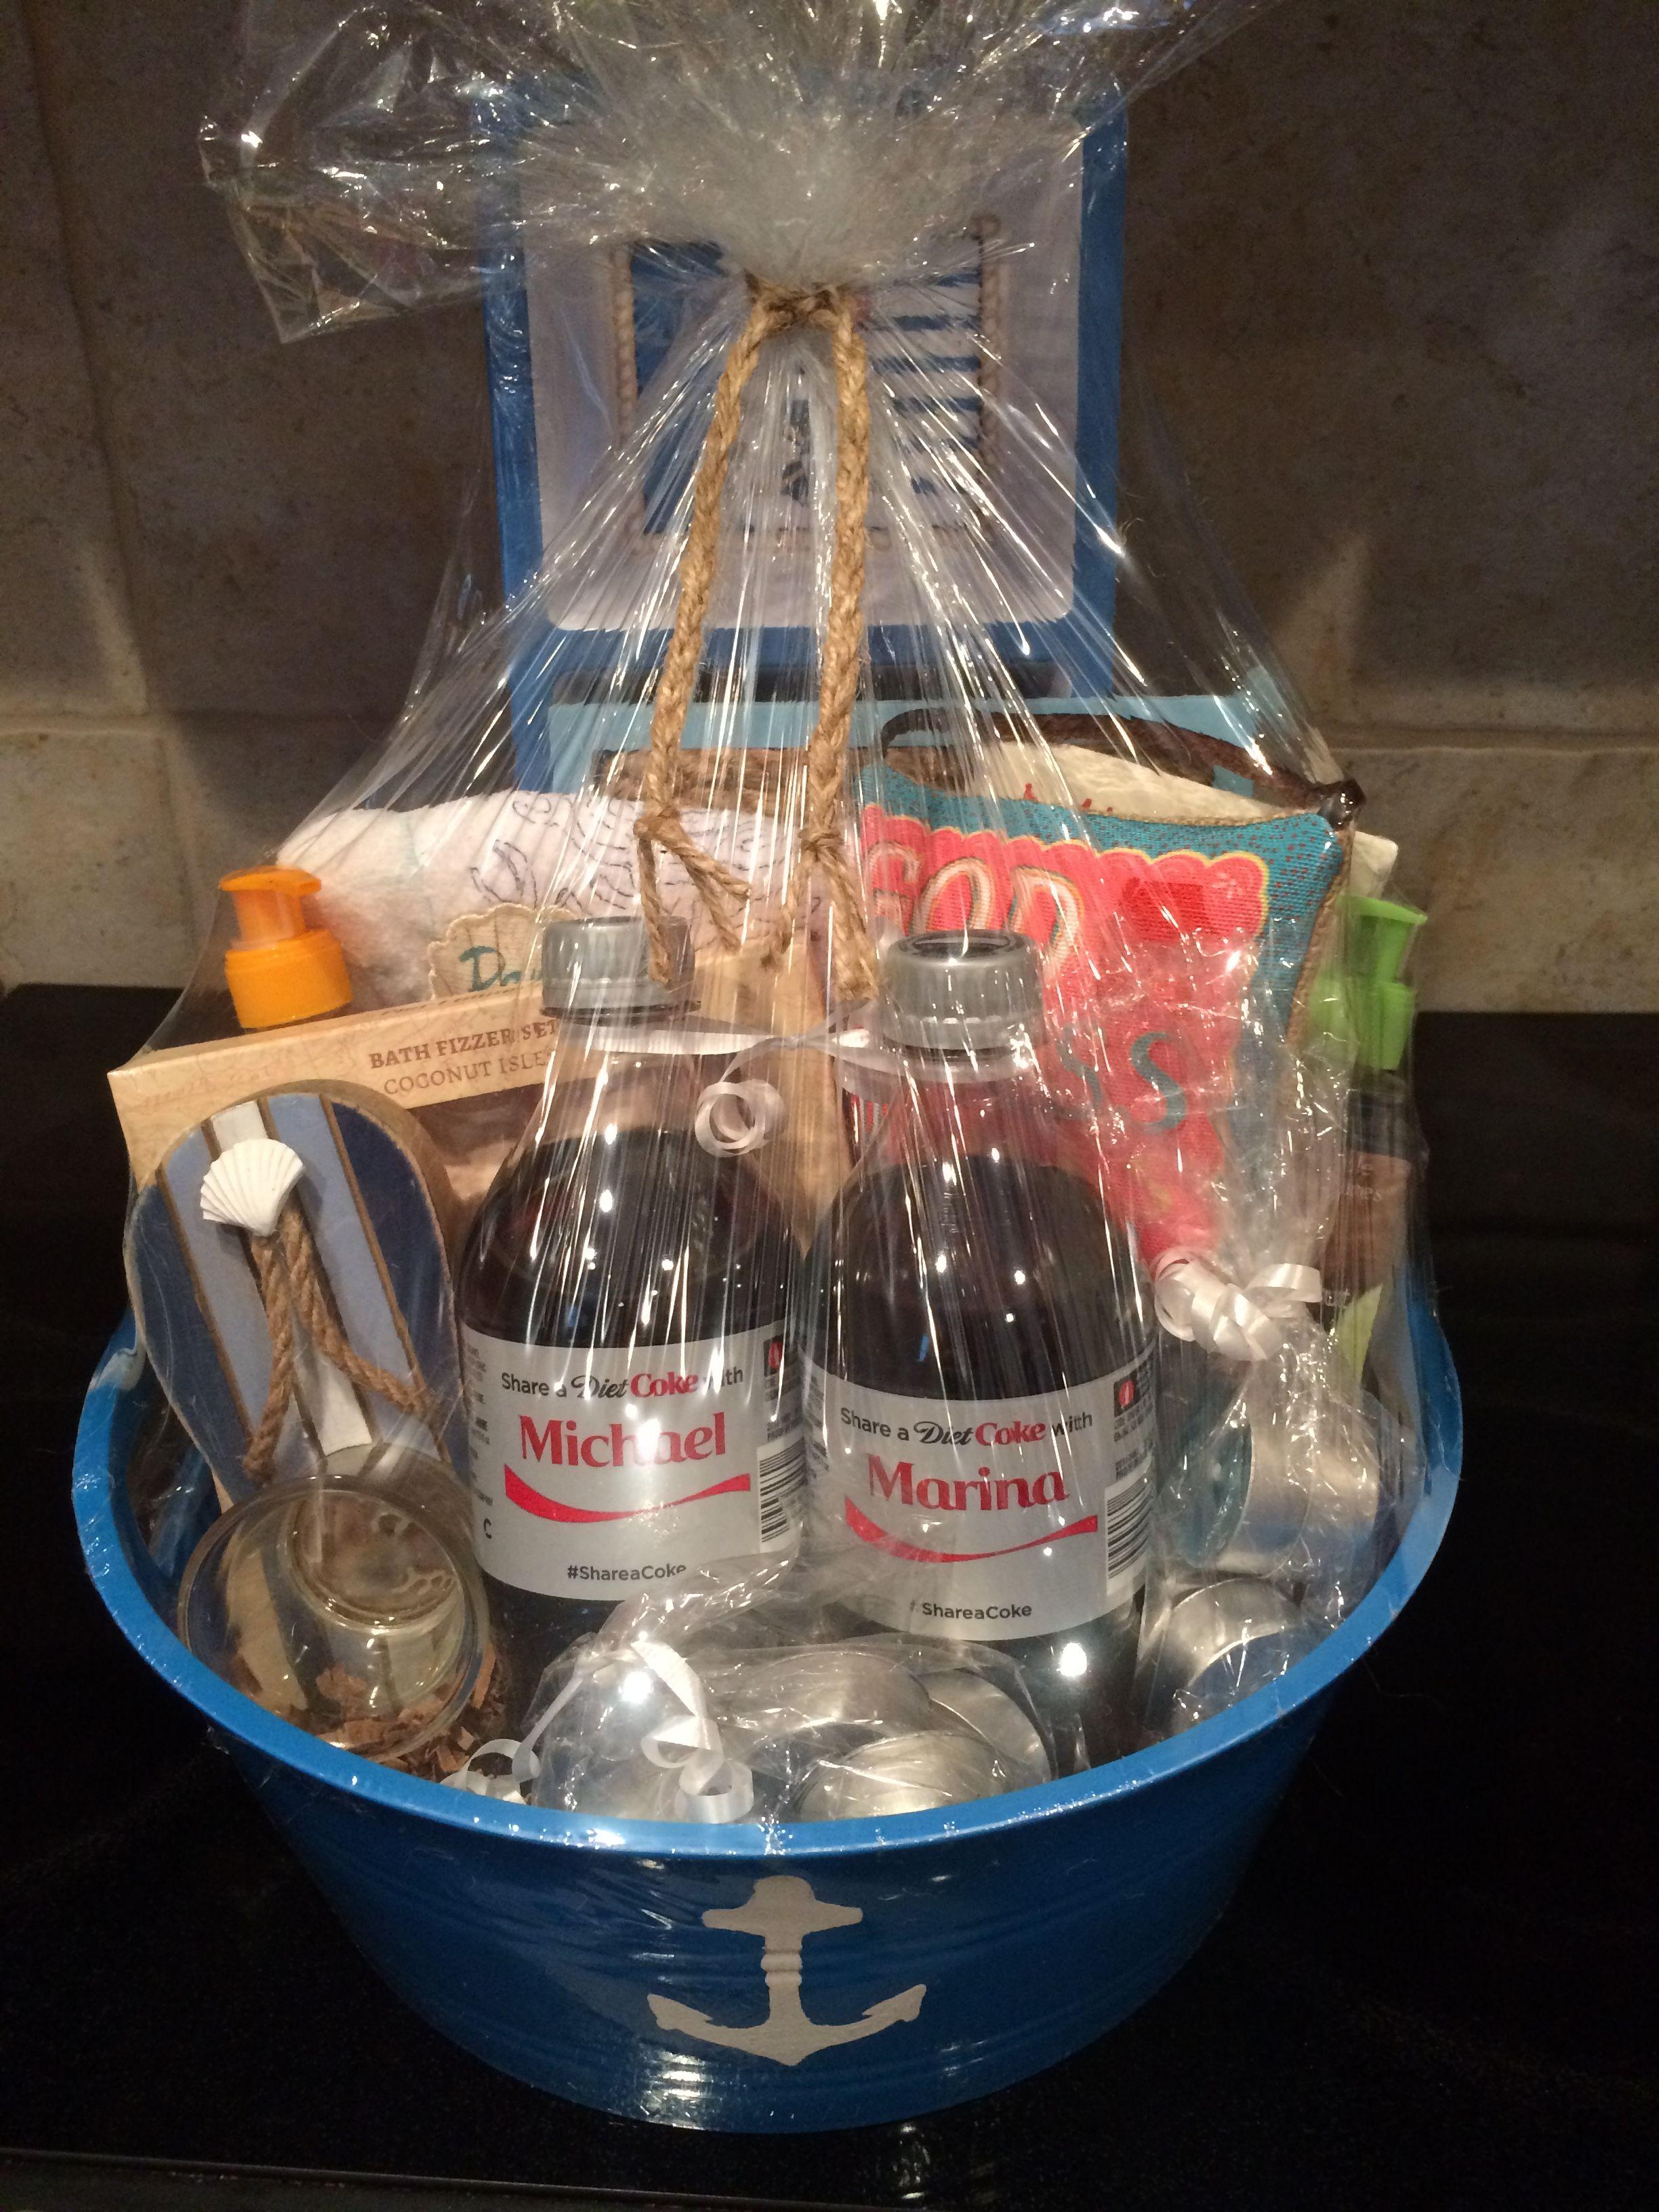 Coastal themed gift basket for a beachhouse warming gift